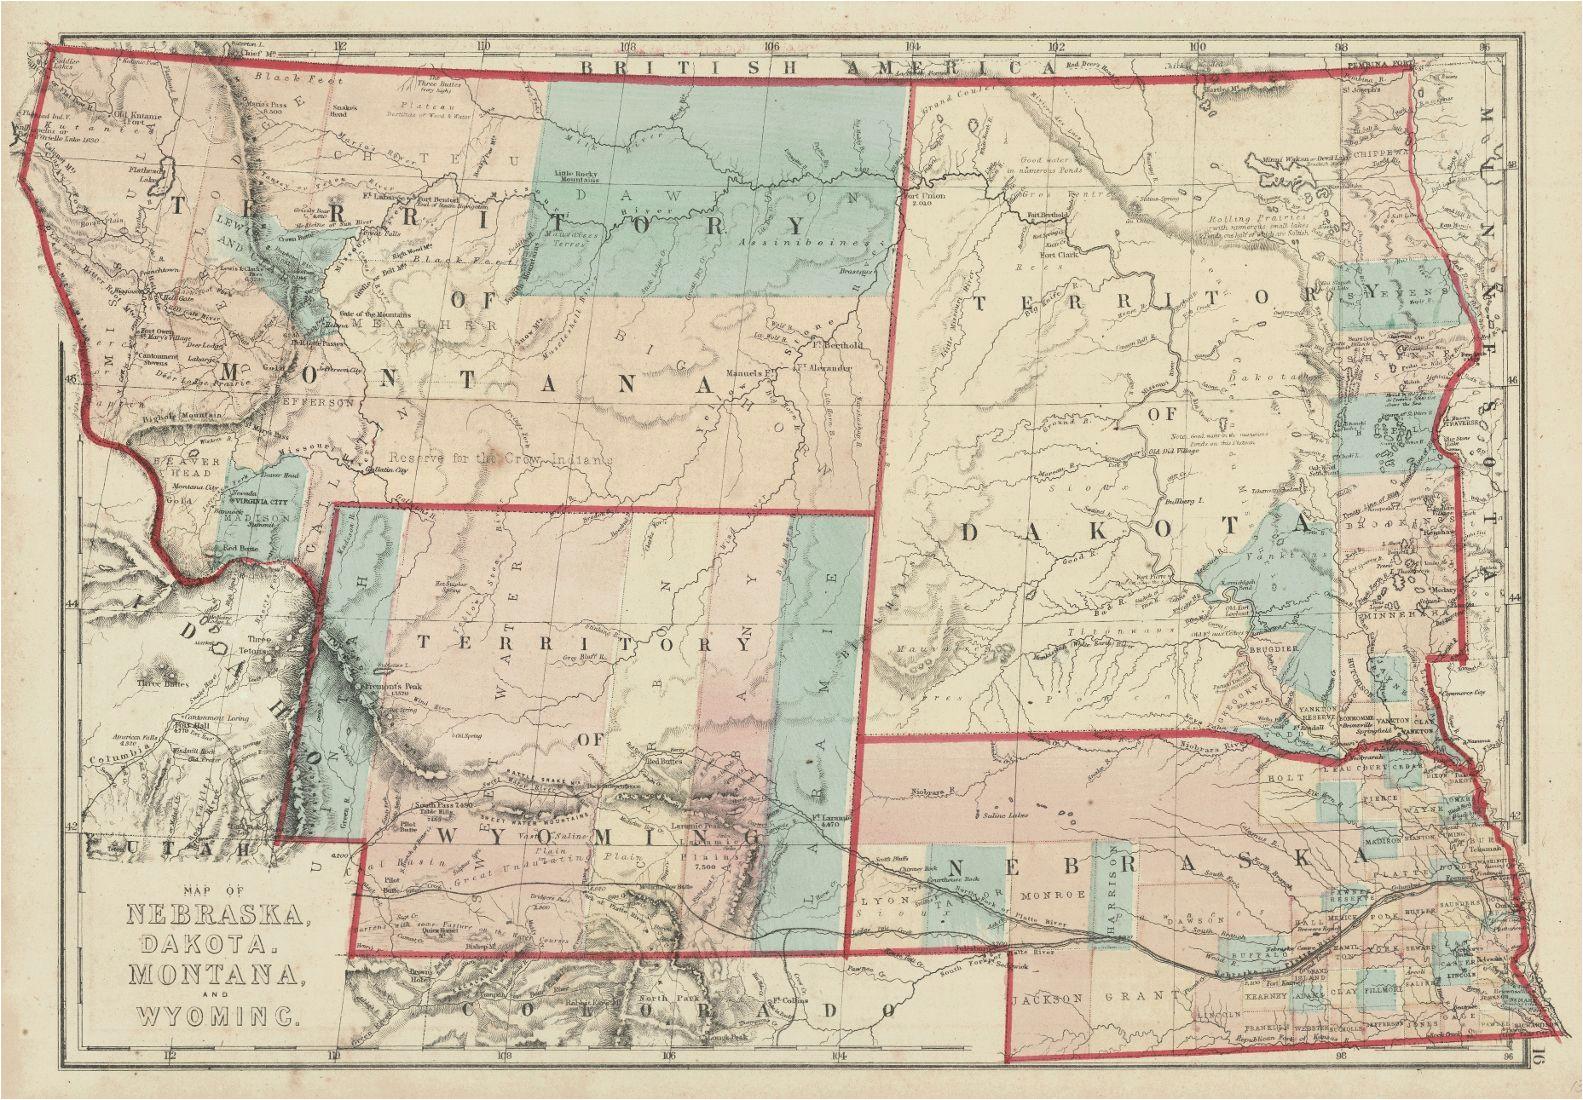 map of nebraska dakota montana and wyoming h h hardesty co